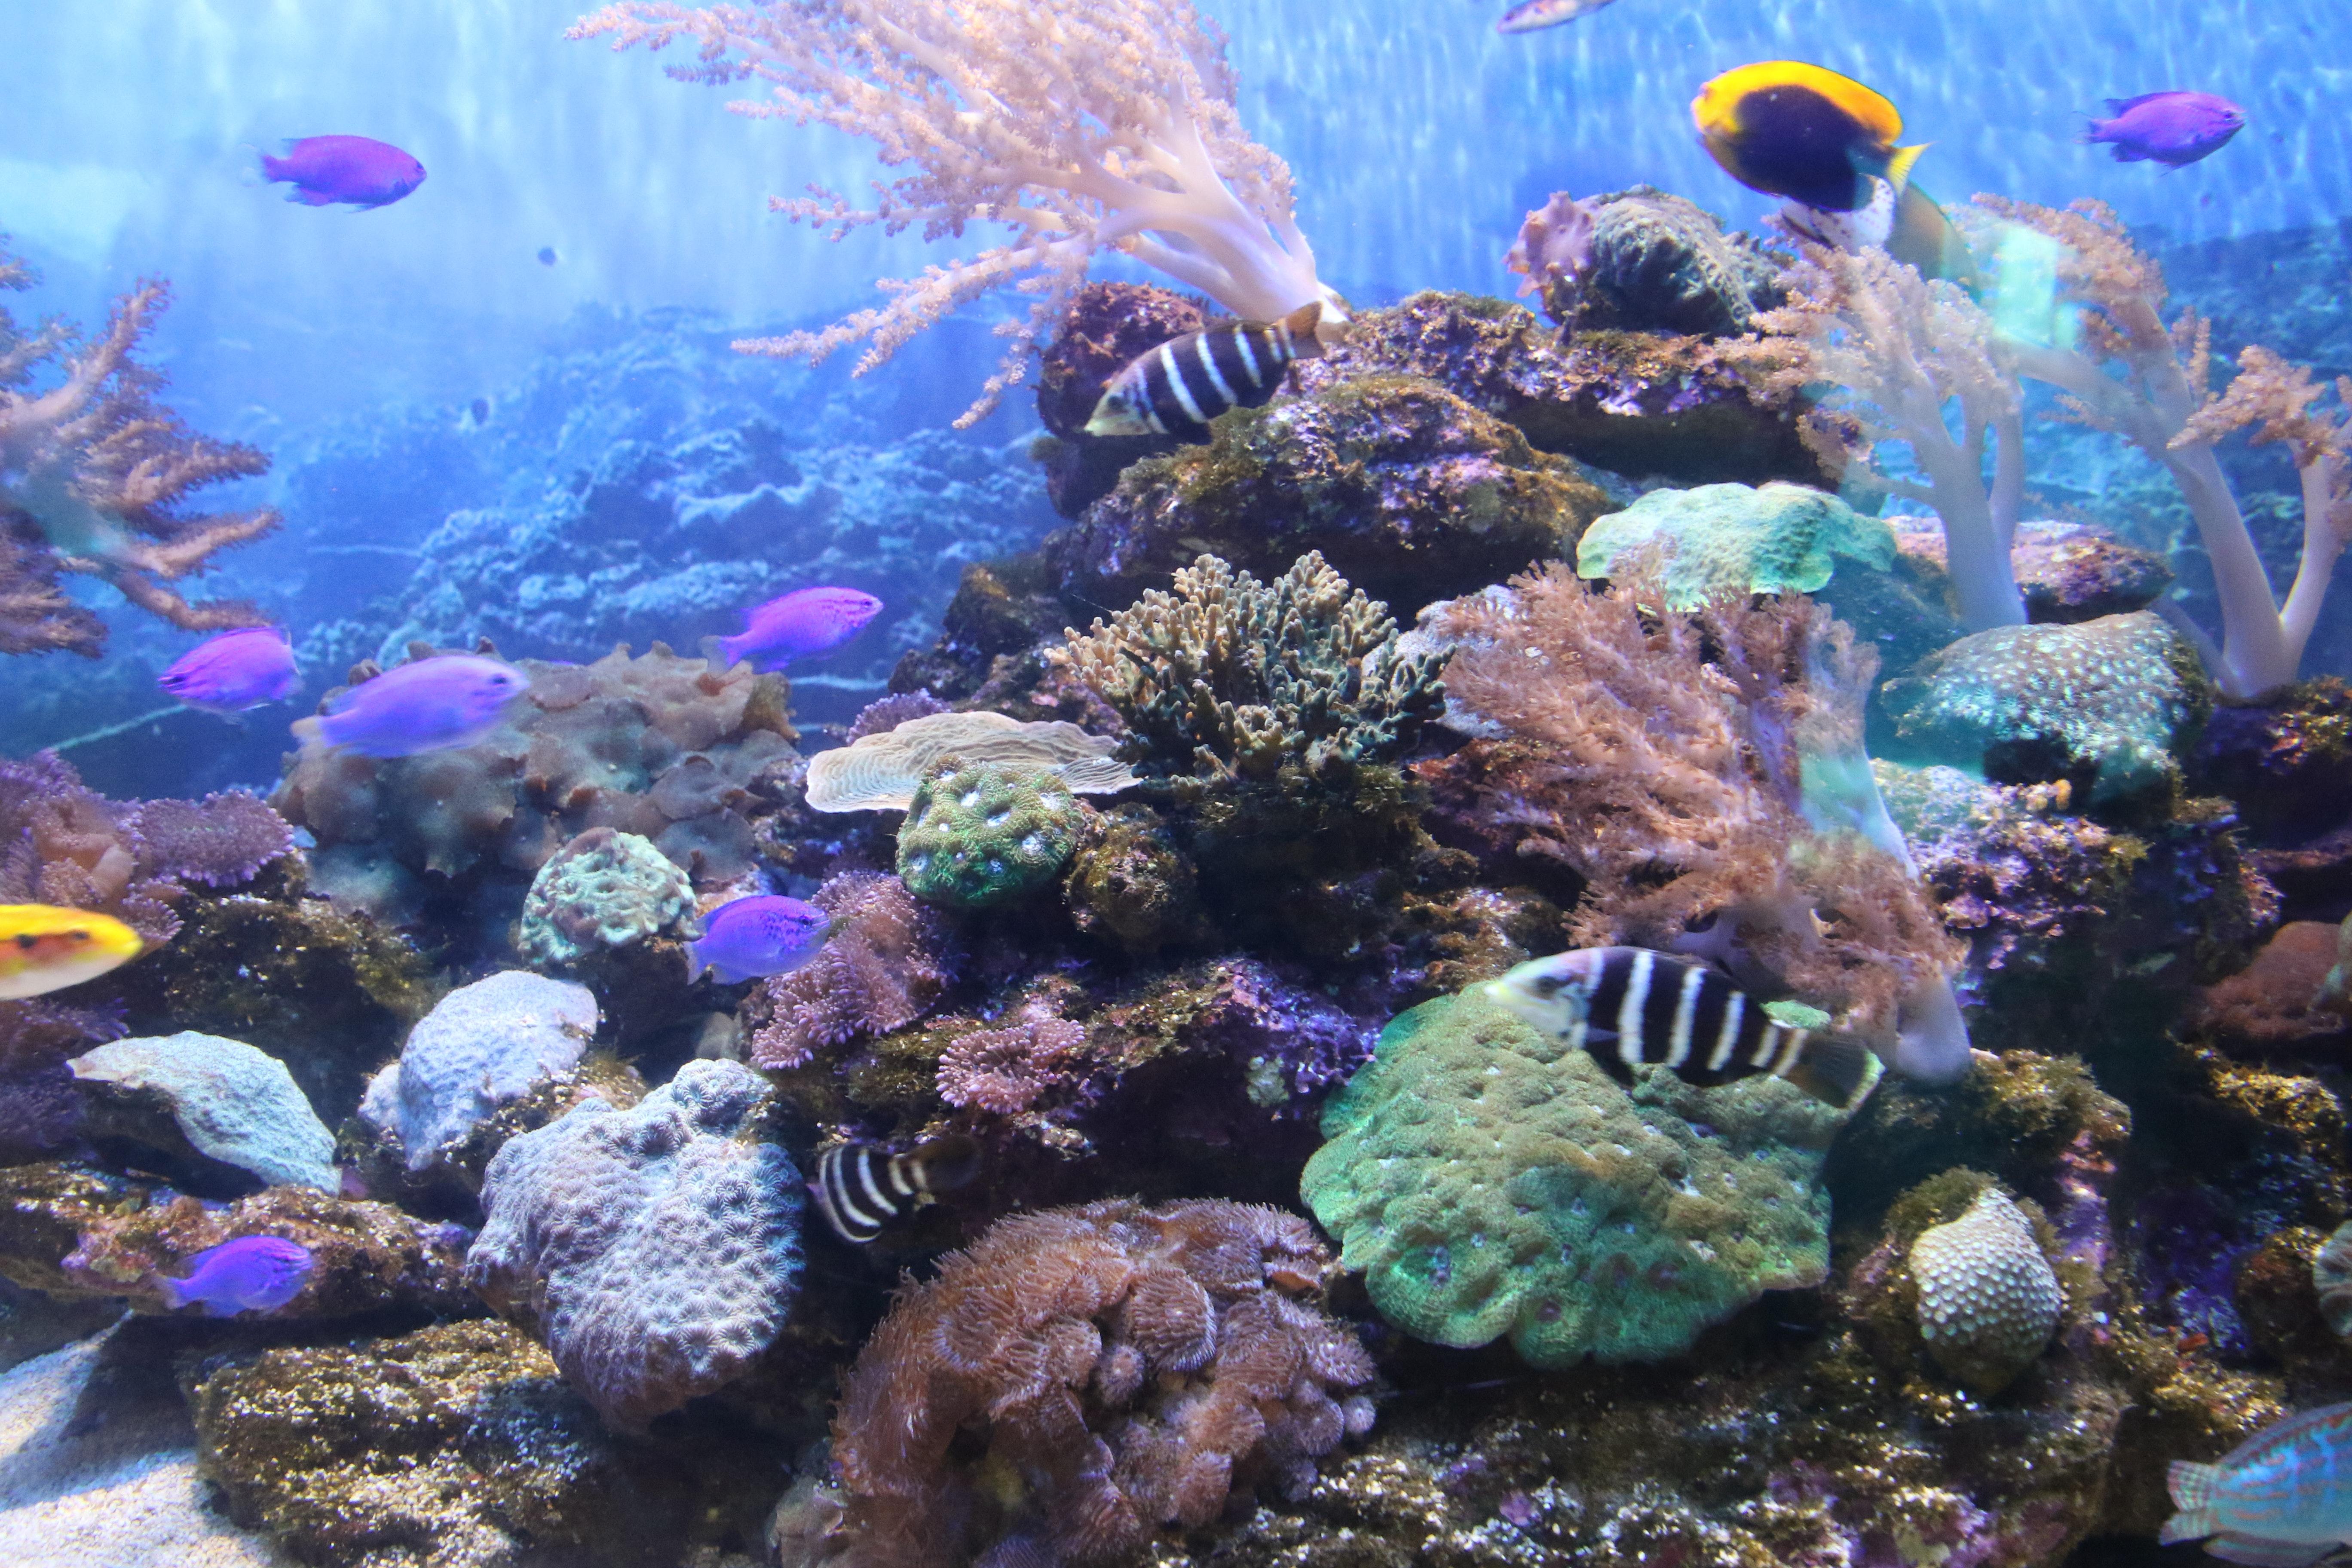 Exotic fish swimming in the sea photo